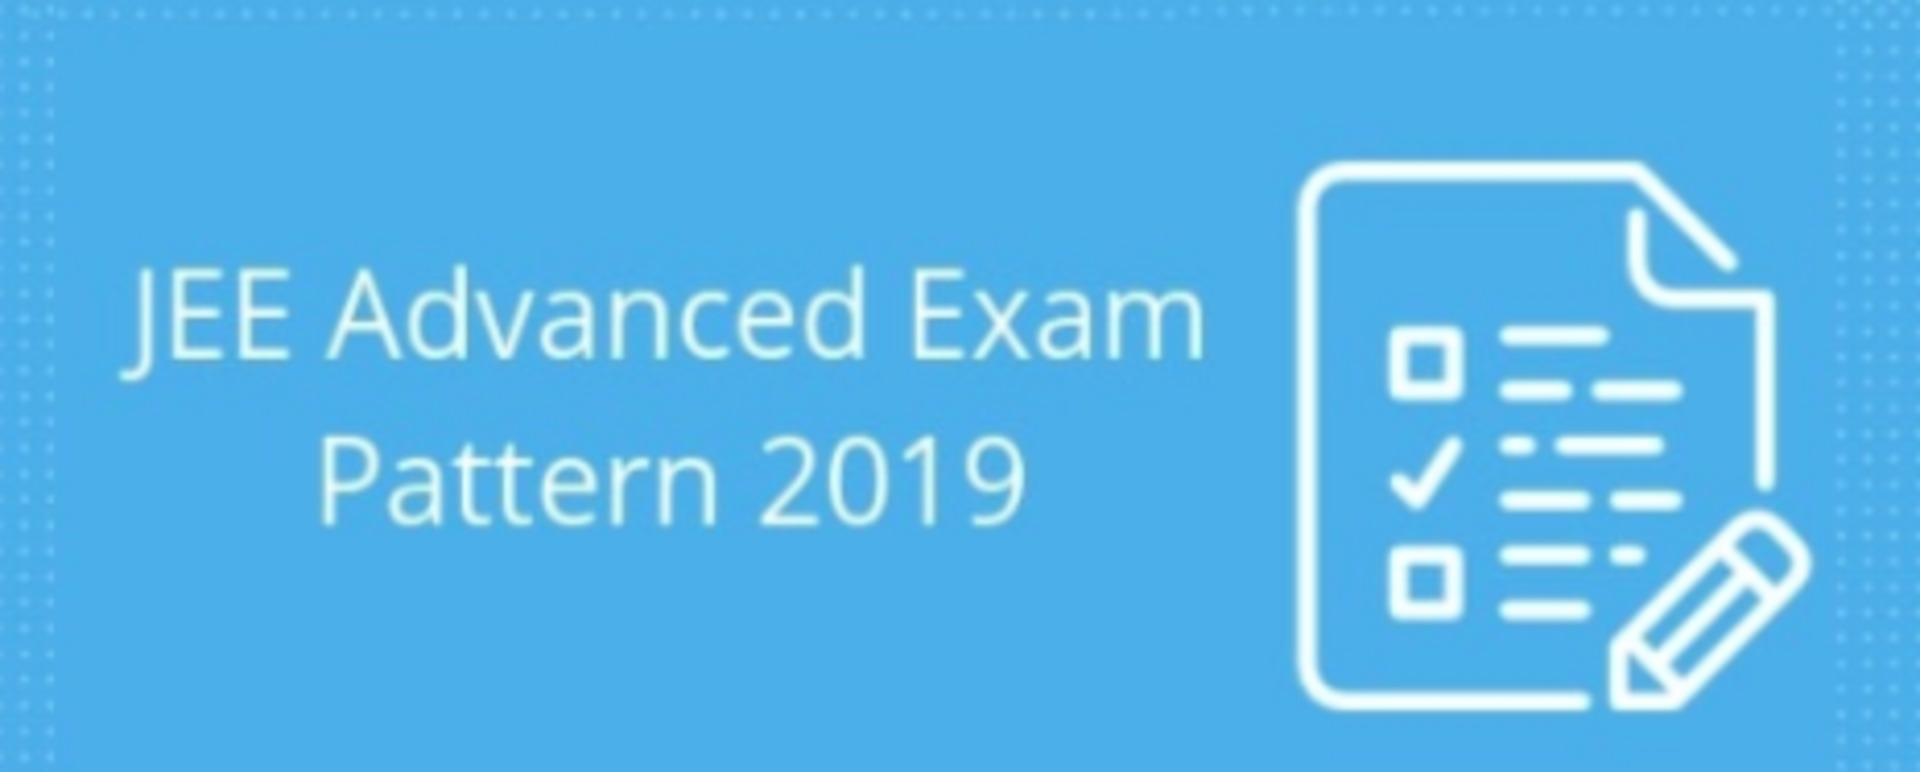 JEE Advanced 2019 Exam Pattern image